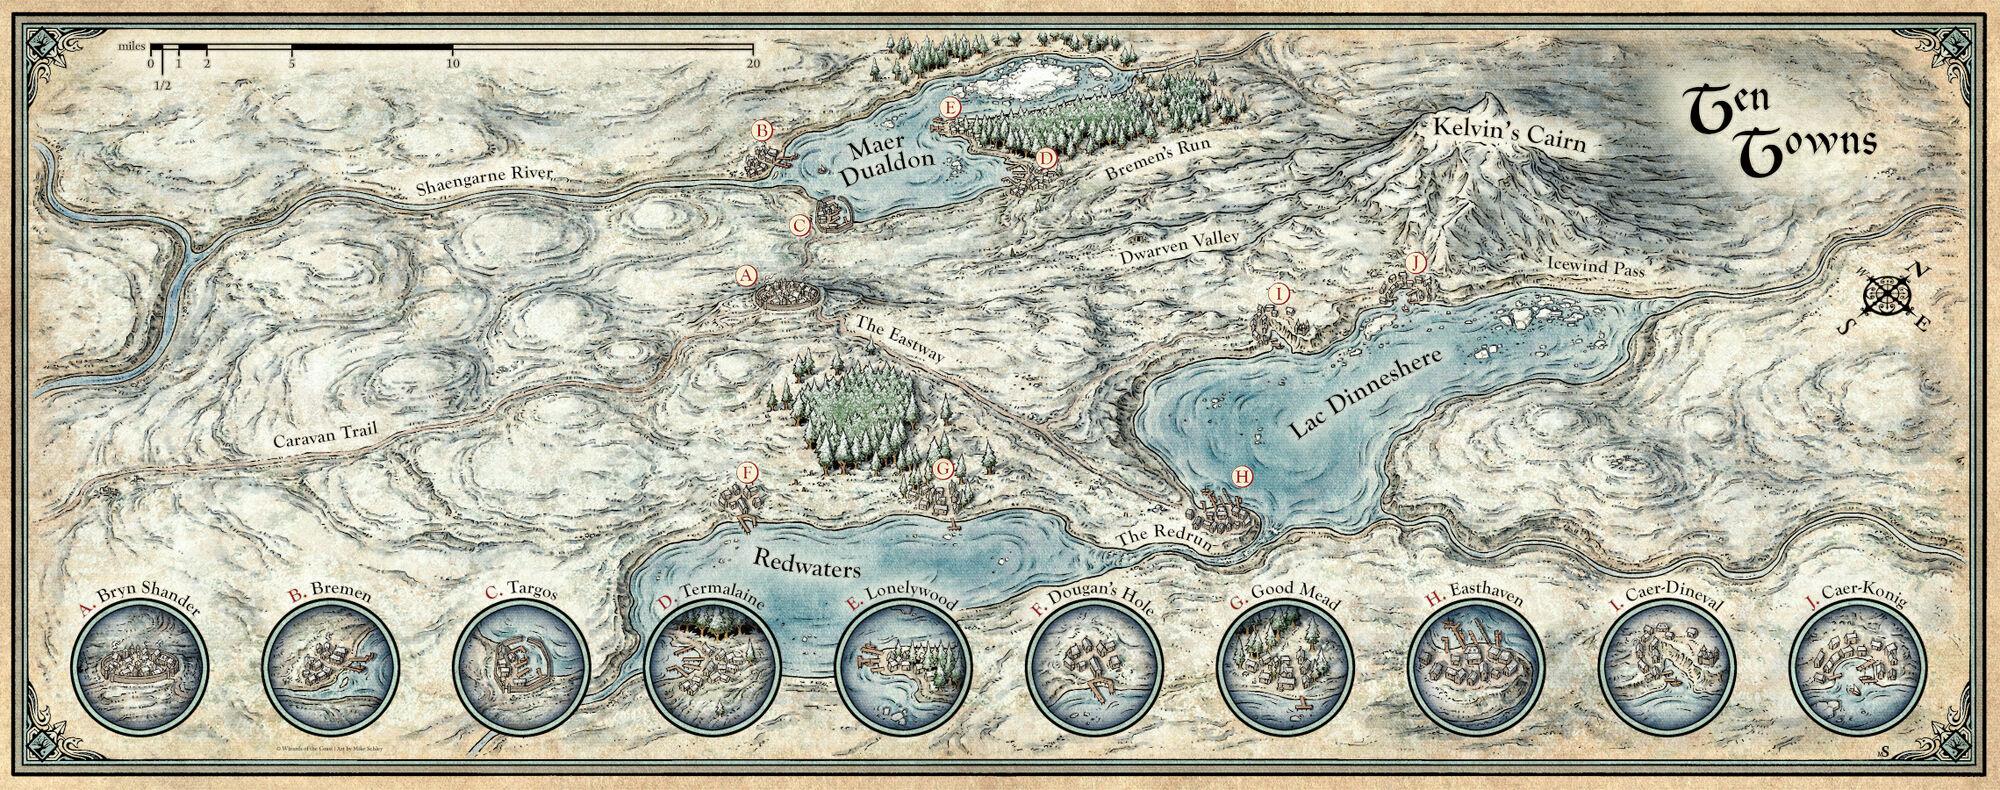 Ten Towns | Forgotten Realms Wiki | FANDOM powered by Wikia on